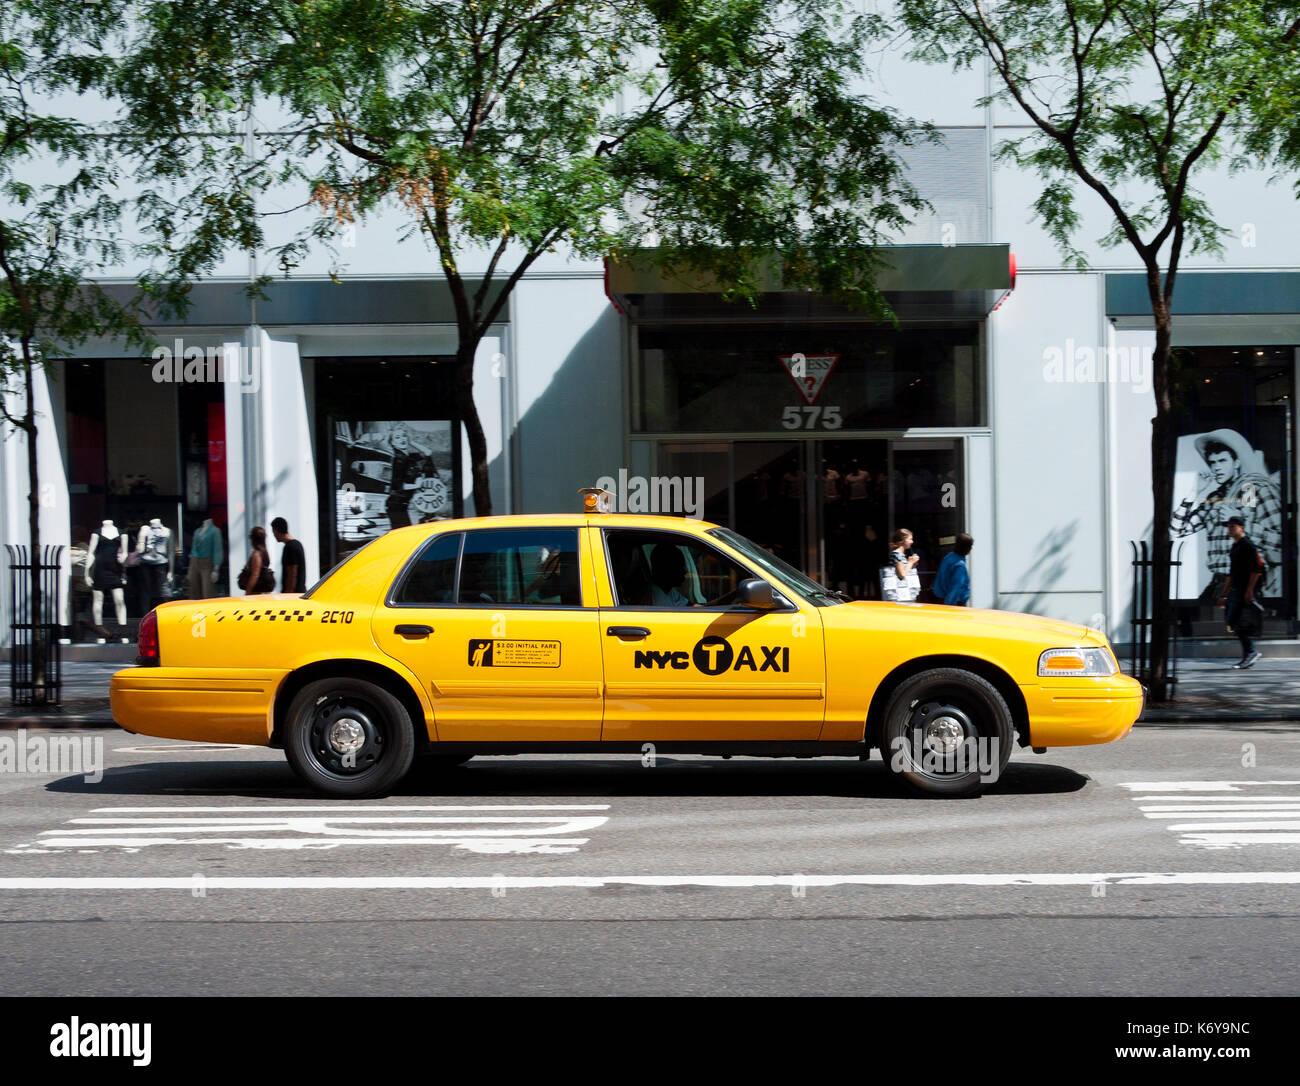 Yellow Taxi Cab Stock Photo: 159181608 - Alamy